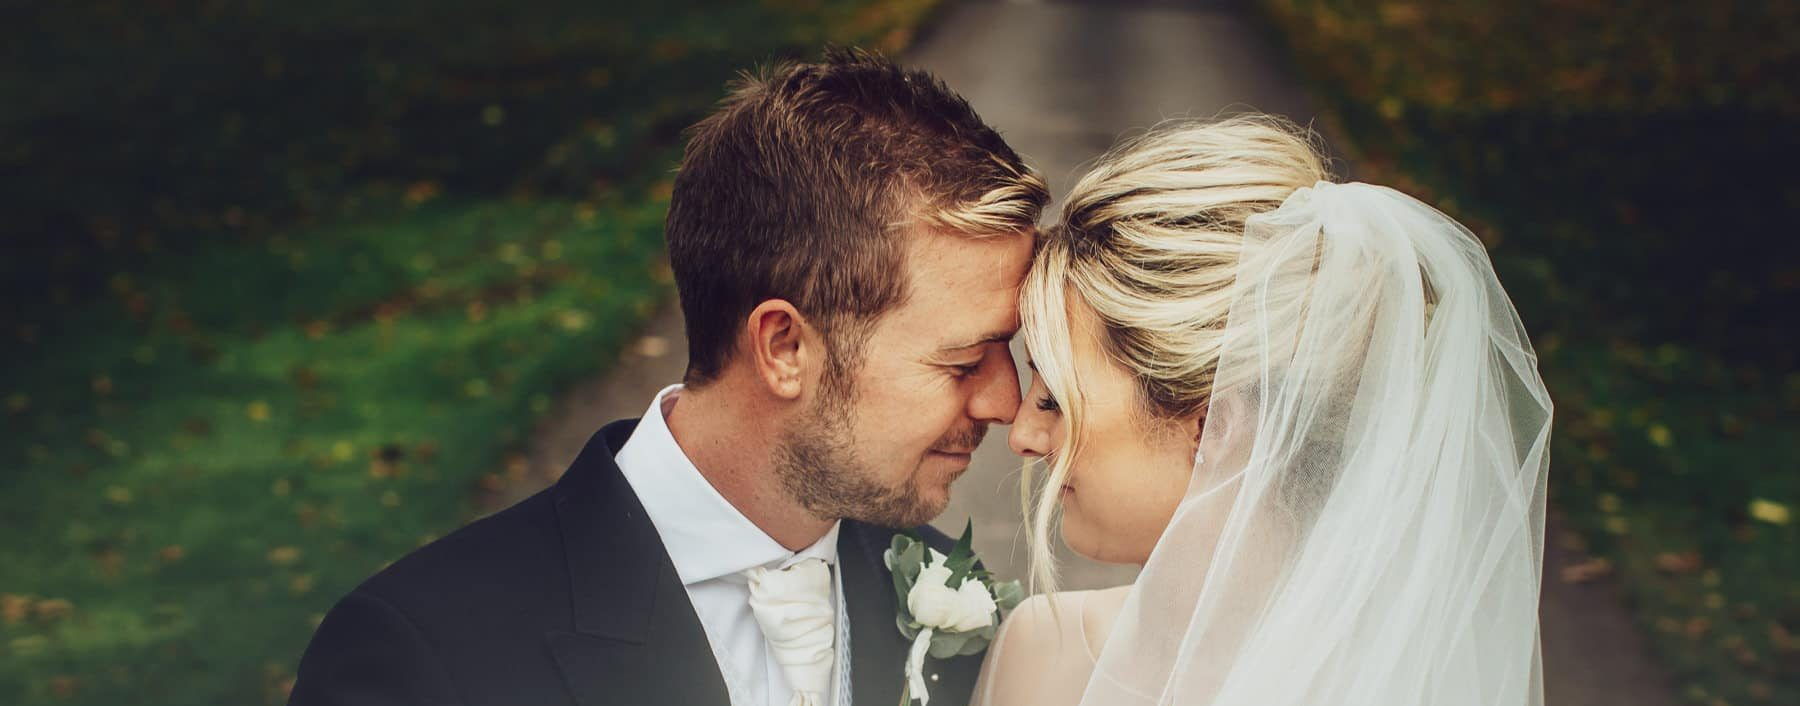 wedding photographer at soughton hall